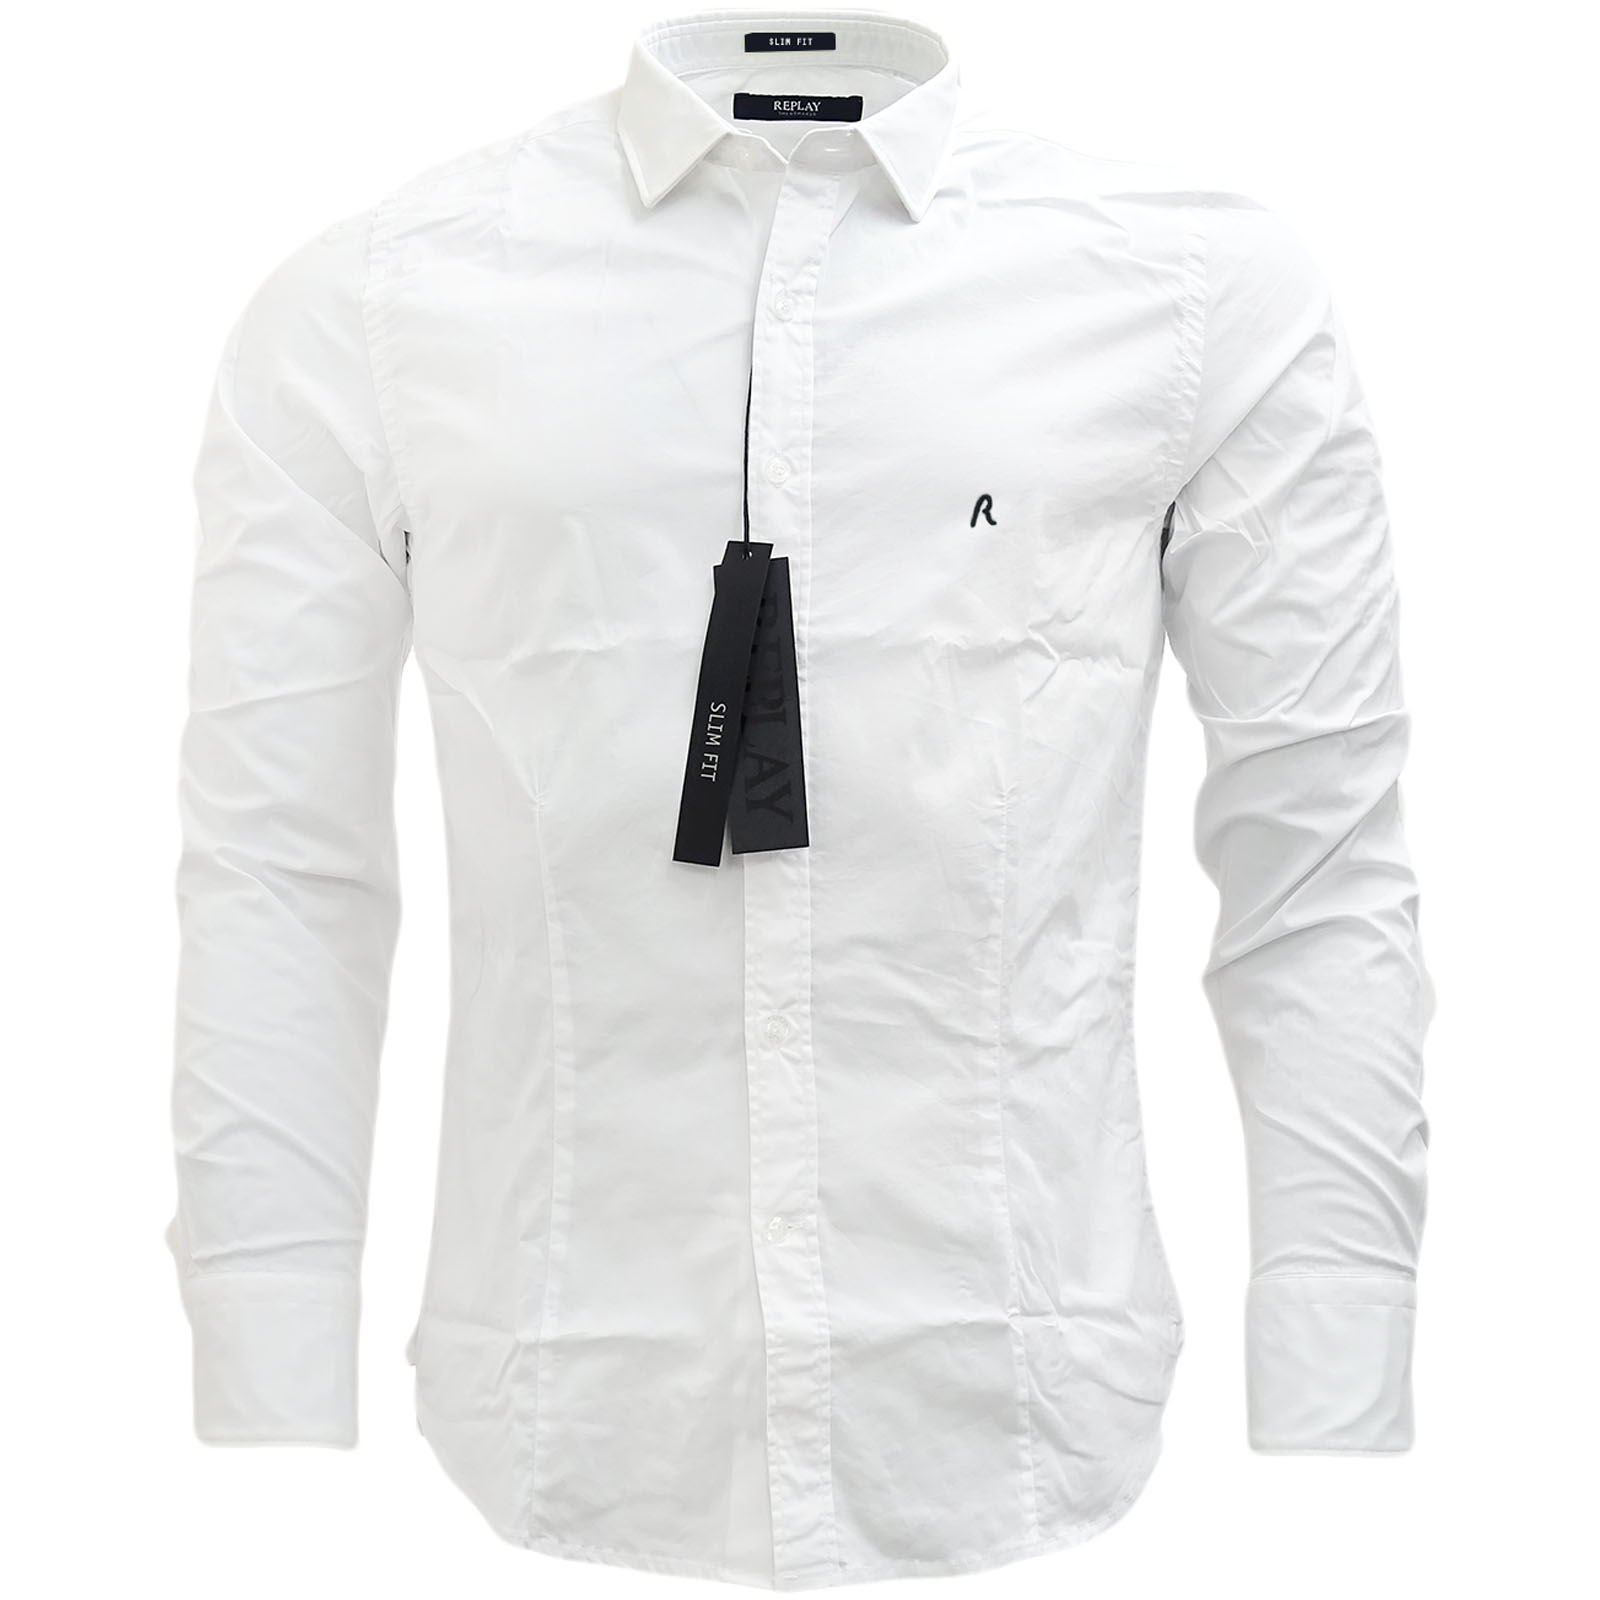 M4941 M4941 Shirt Plain XXL M L Replay XL Slim Slim Fit S eBay Long Sleeve xwRnnXaqUY